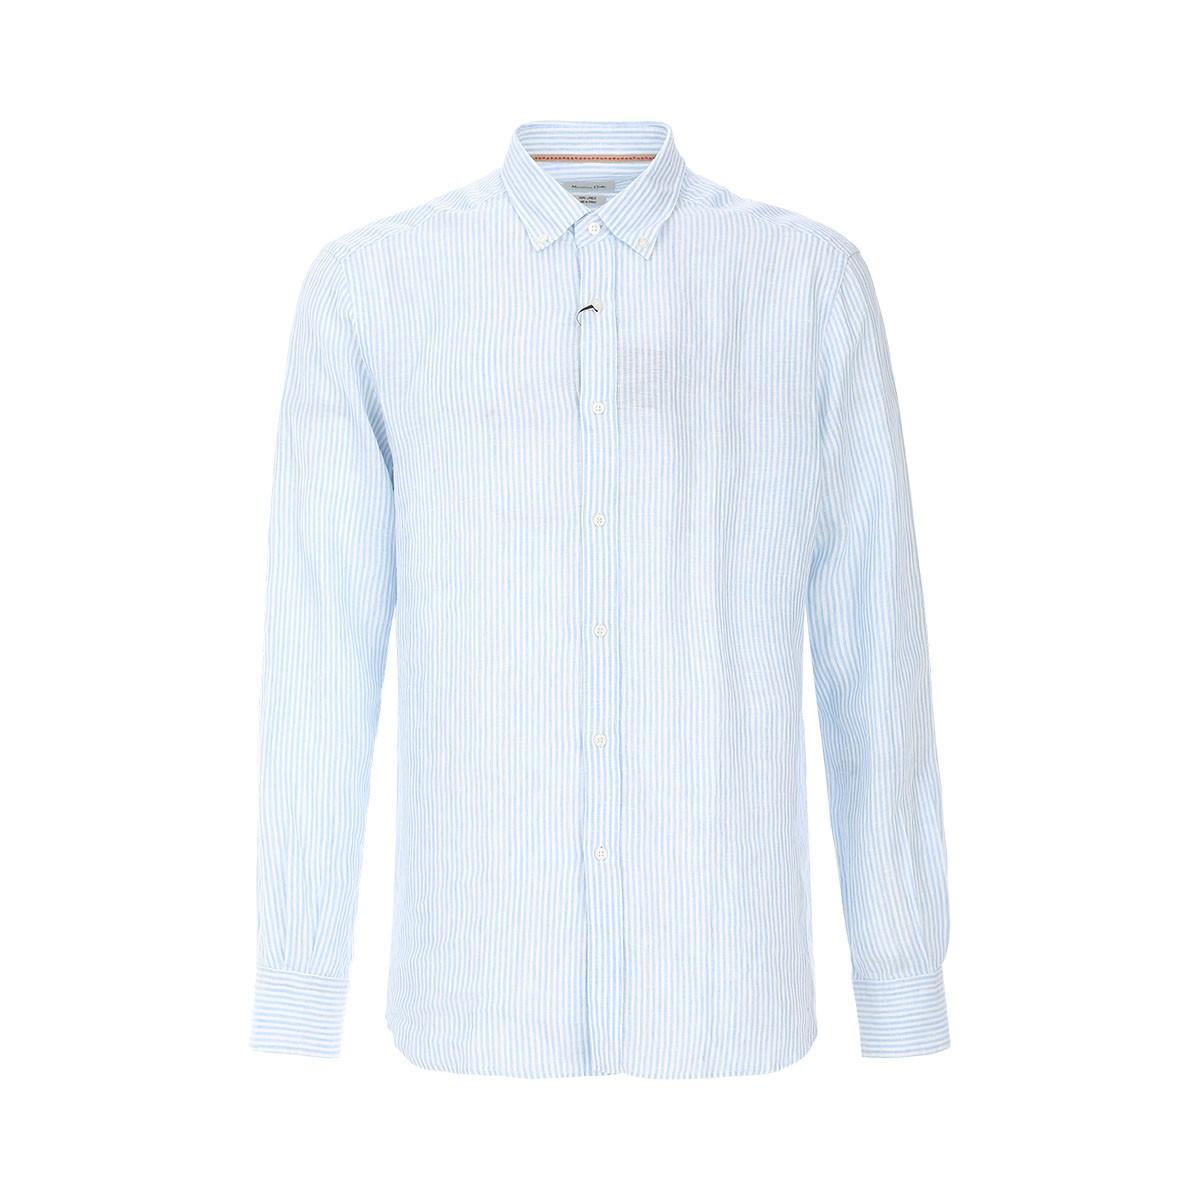 Massimo Dutti 16363403 男士条纹休闲衬衫